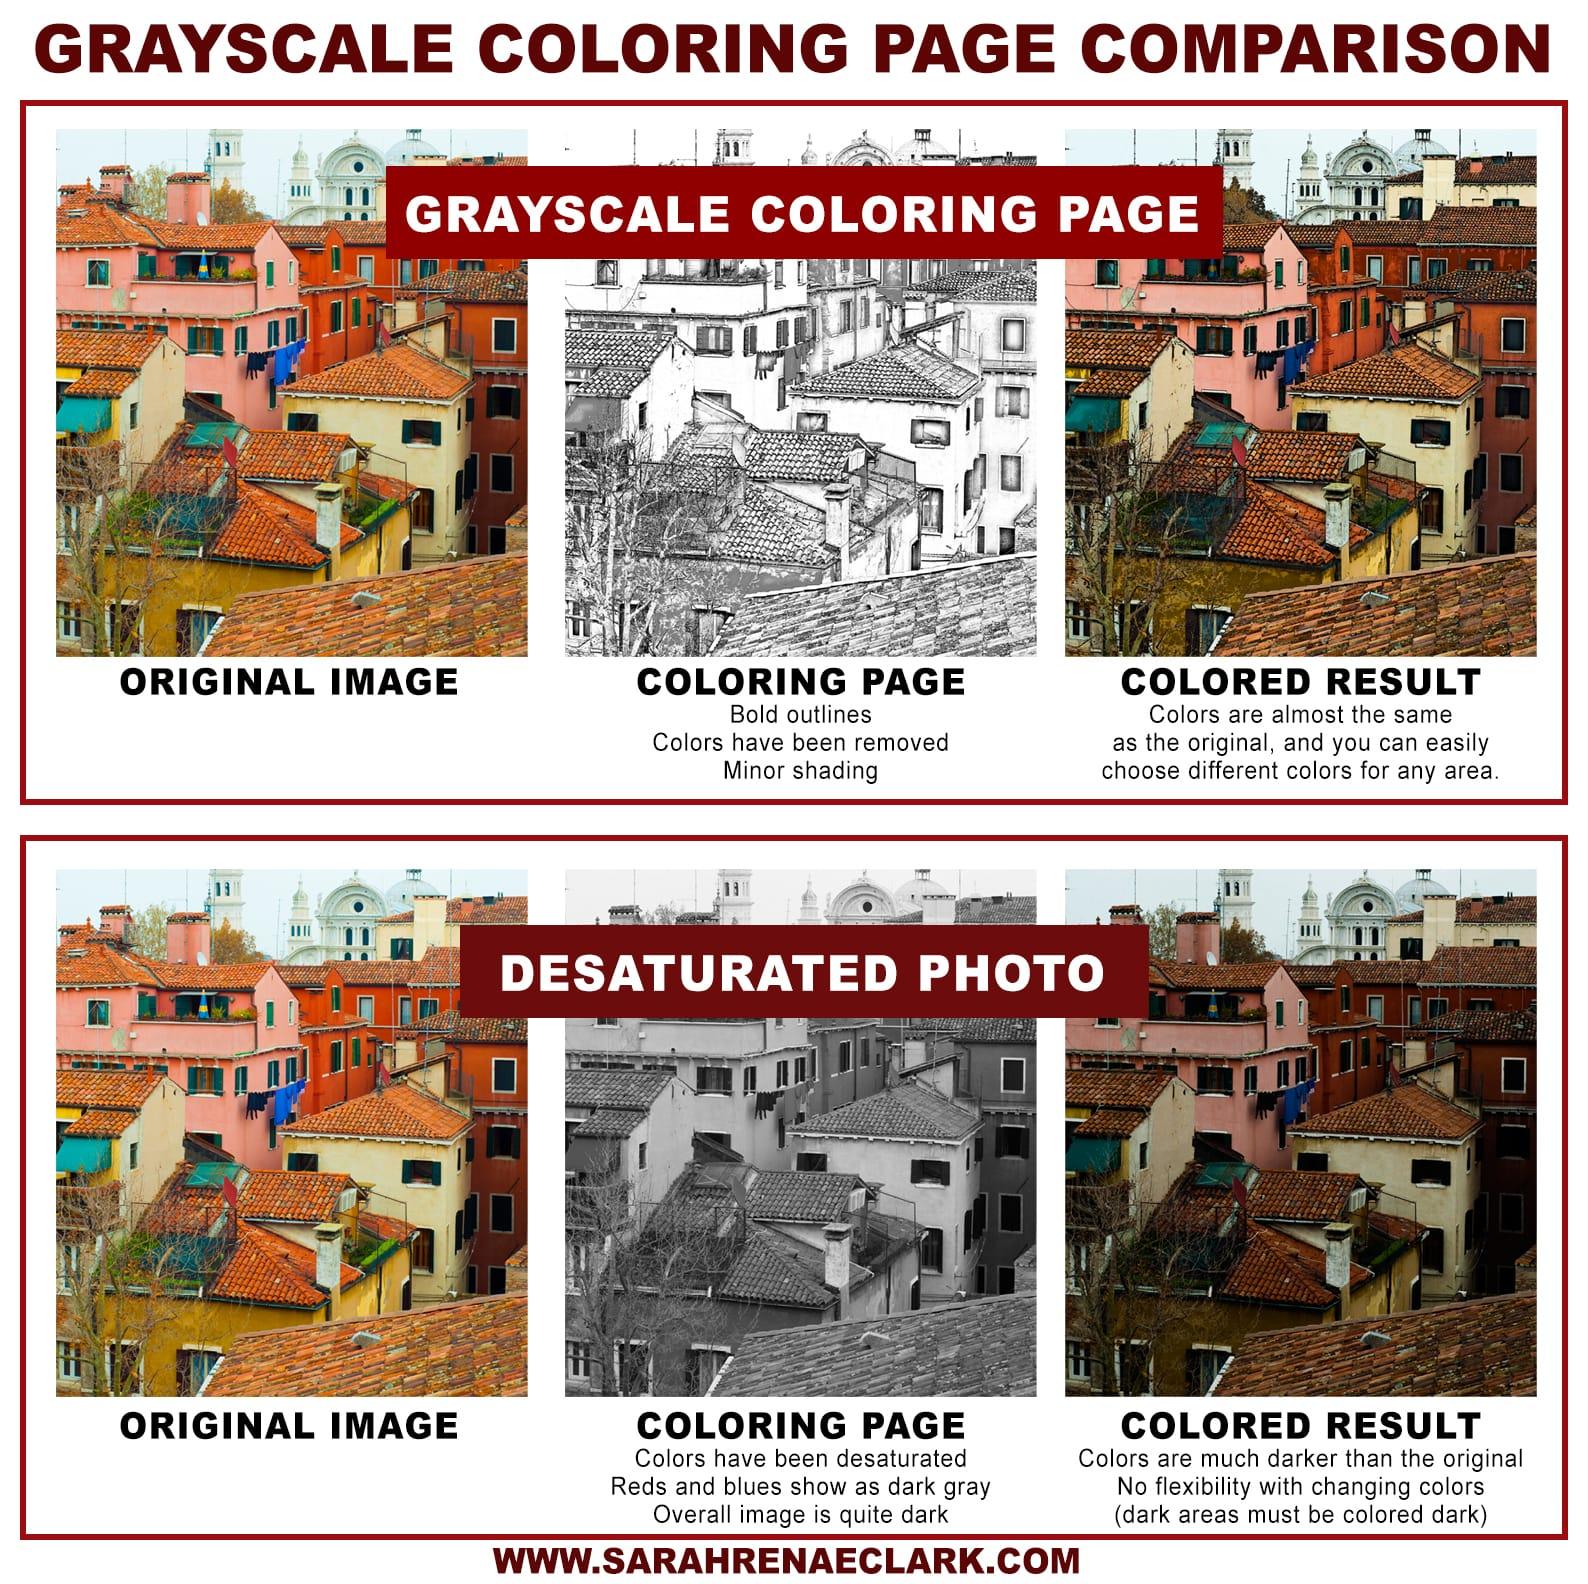 Grayscale coloring page comparison